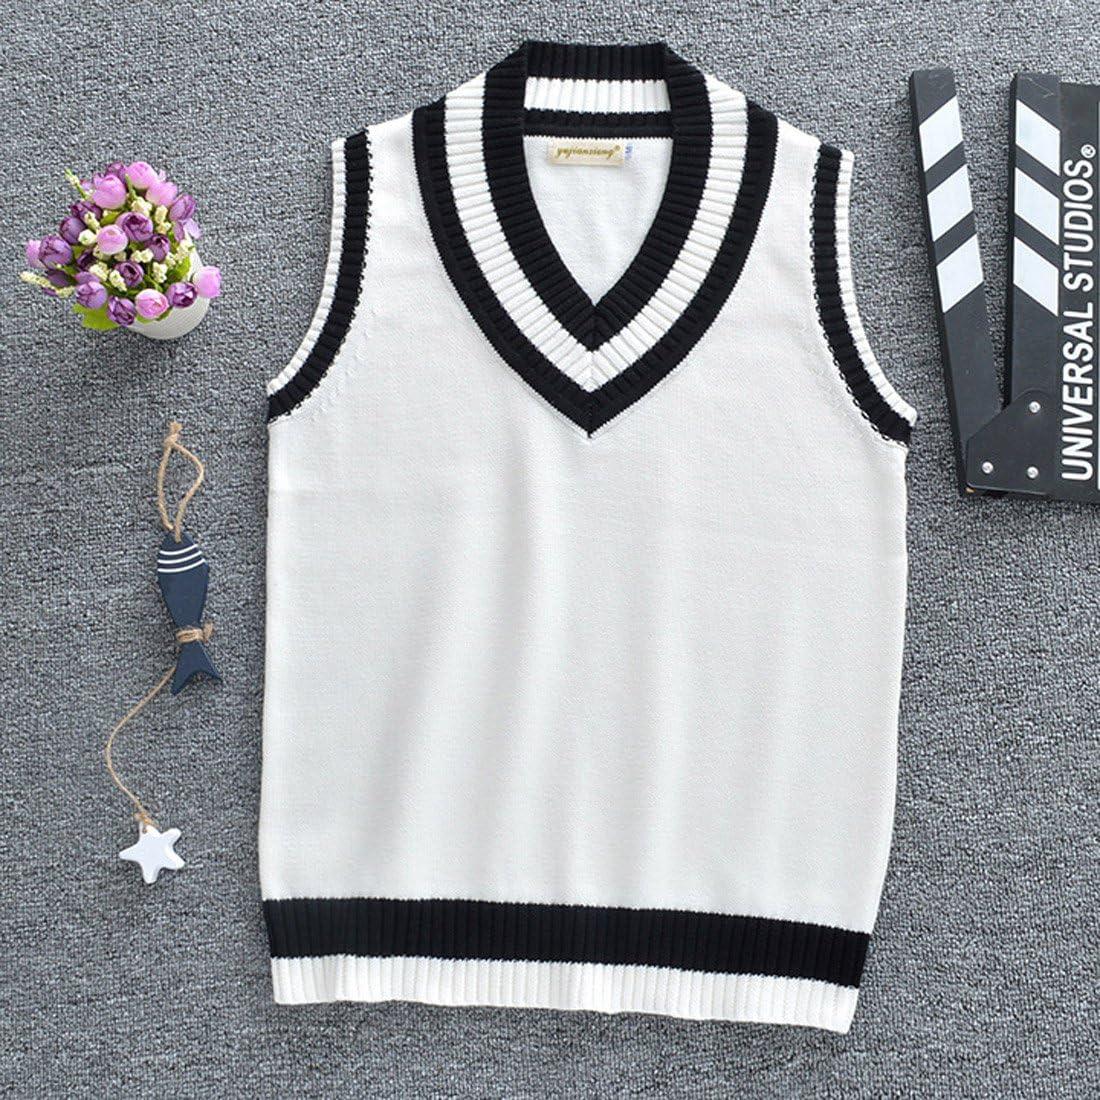 Szolno Pullover Sleeveless Sweater Cotton V-Neck Vest School Cardigan Men Women